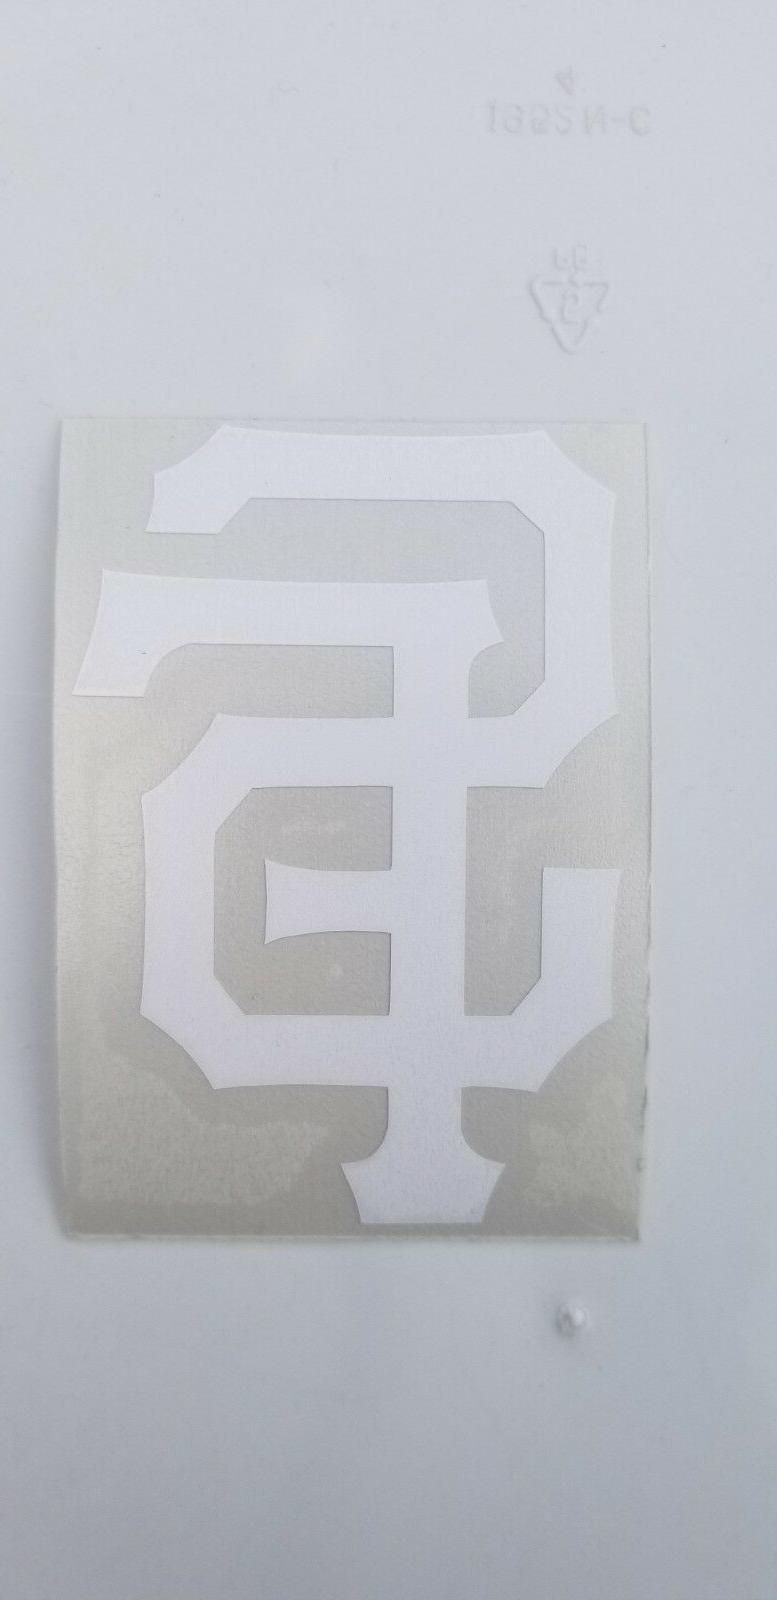 San Giants logo Orange White Vinyl Decal Car